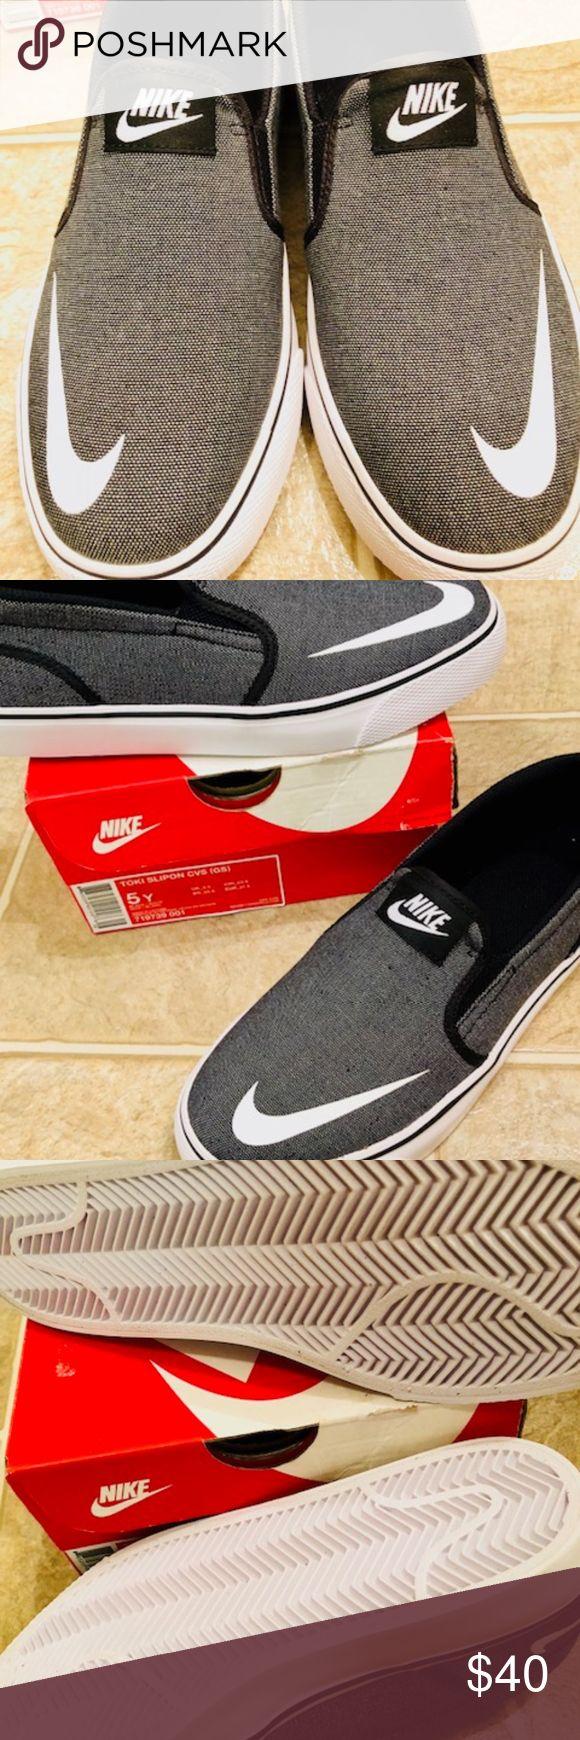 New Boys Nike Toki SlipOn New Boys  Nike Toki SlipOn Grey & White with Black Size 5 Youth Smoke & Pet Free Nike Shoes